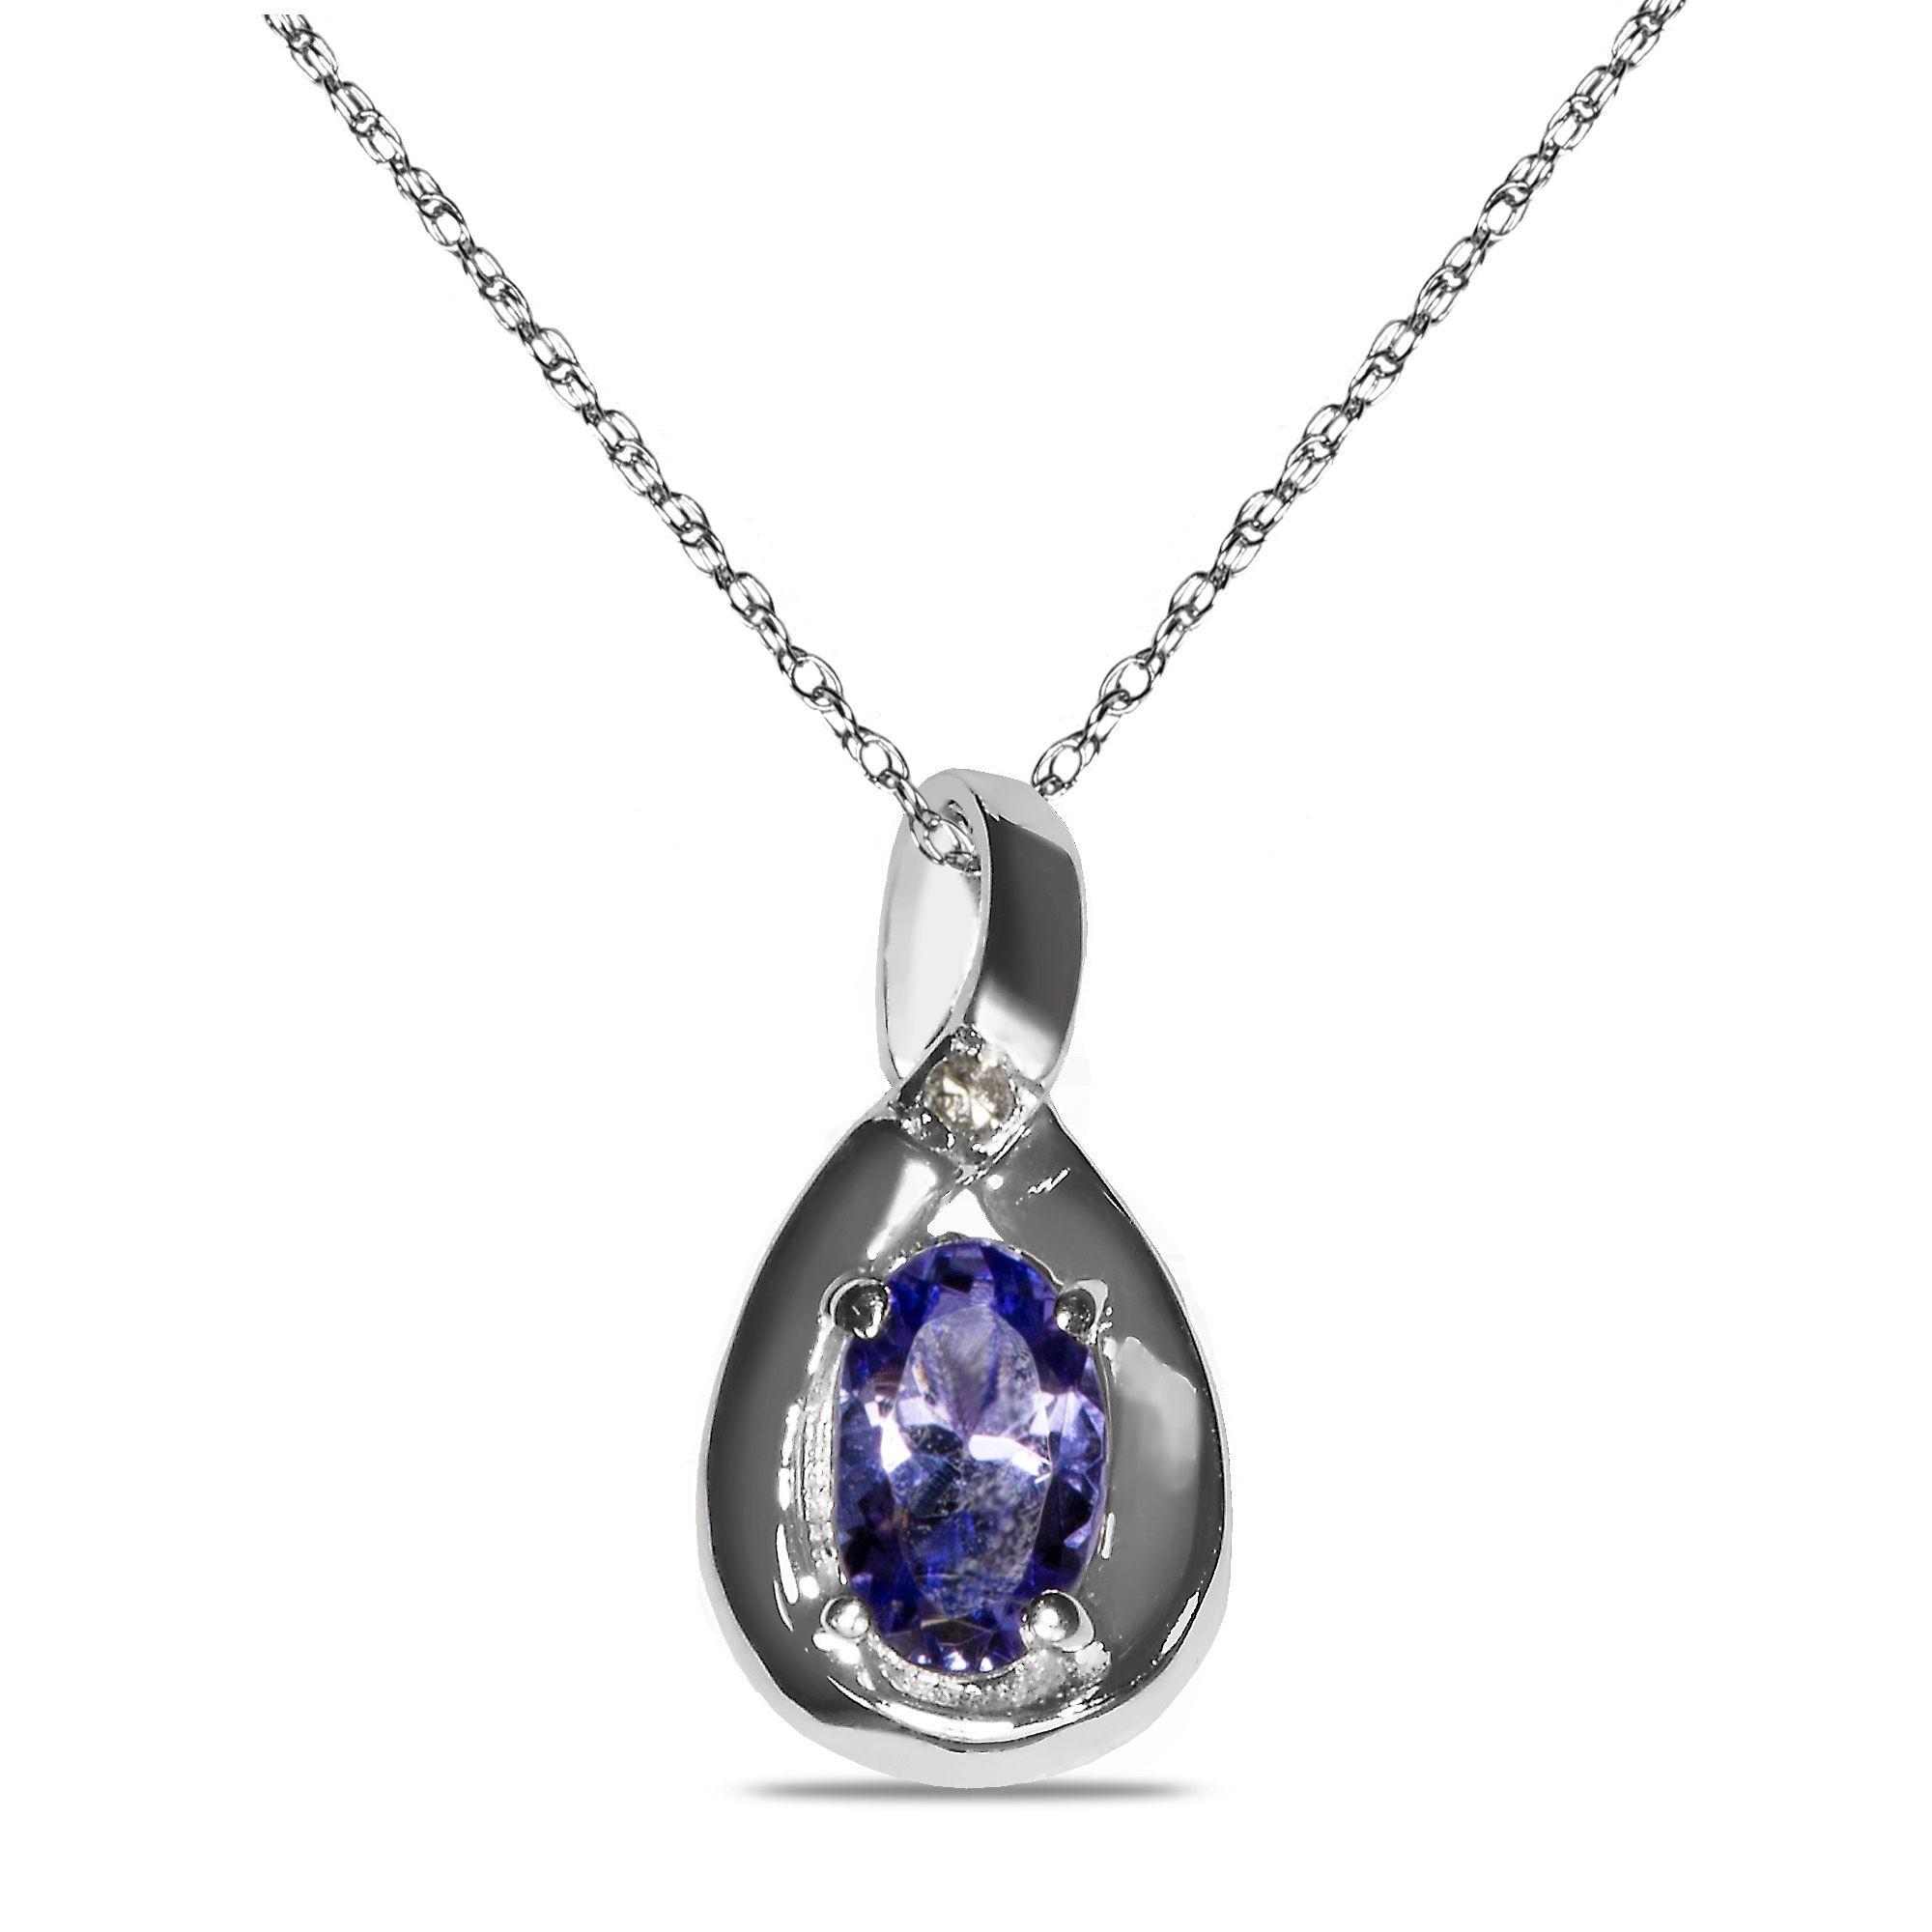 Etsy NissoniJewelry presents - Diamond Accent Tanzanite Pendant in 10k White Gold    Model Number:P7375A-W077TA    https://www.etsy.com/ru/listing/289113833/diamond-accent-tanzanite-pendant-in-10k